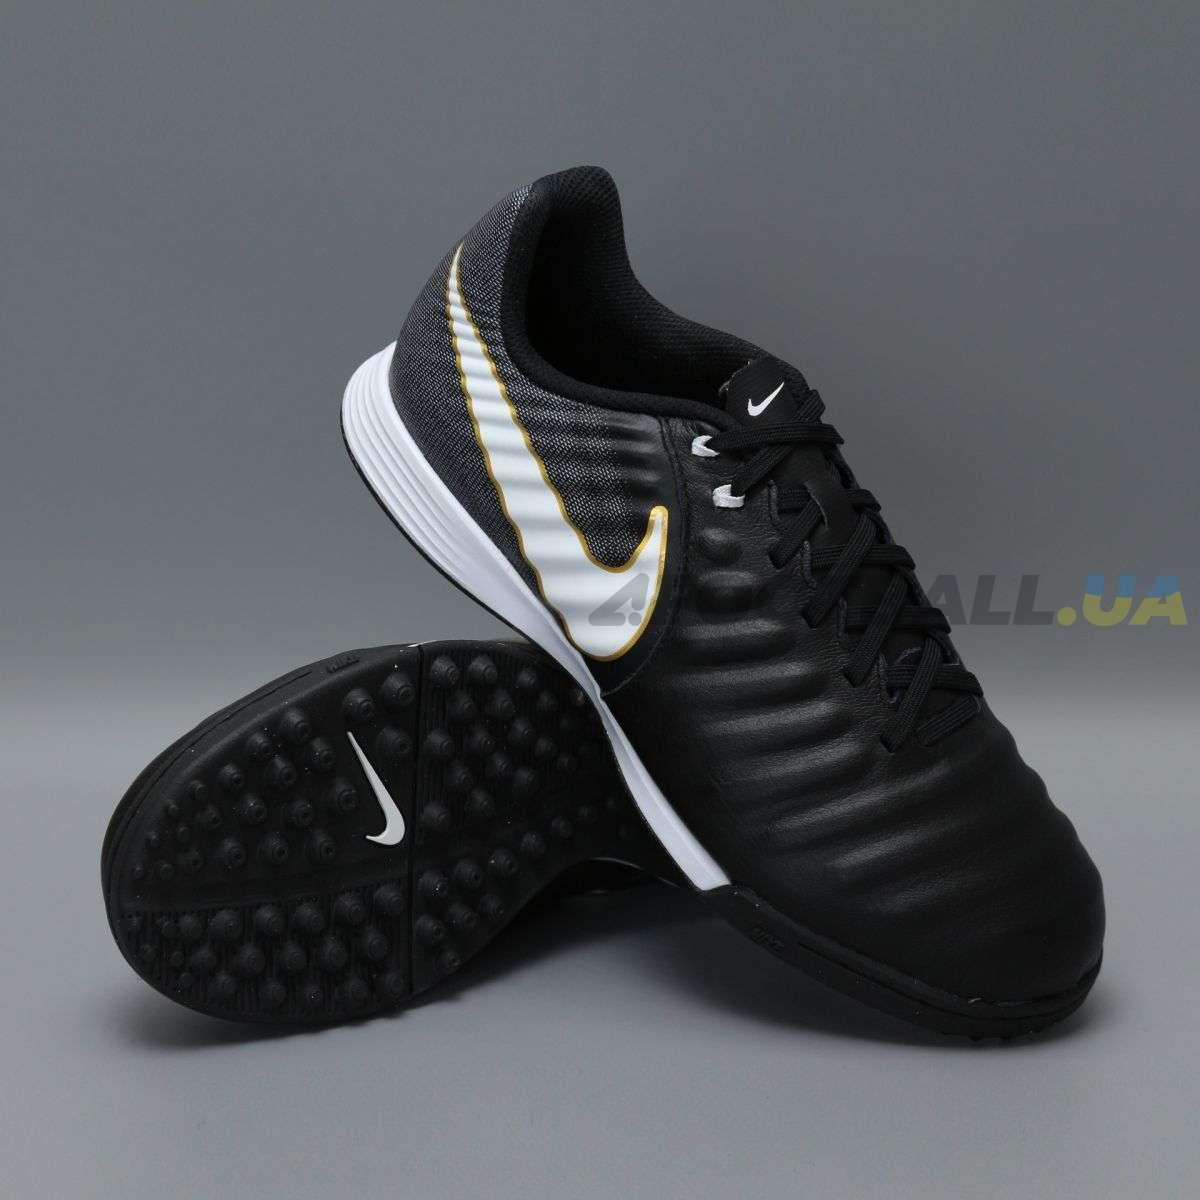 b0afca75 Детские сороконожки Nike TiempoX Ligera TF 897729-002 купить на ...